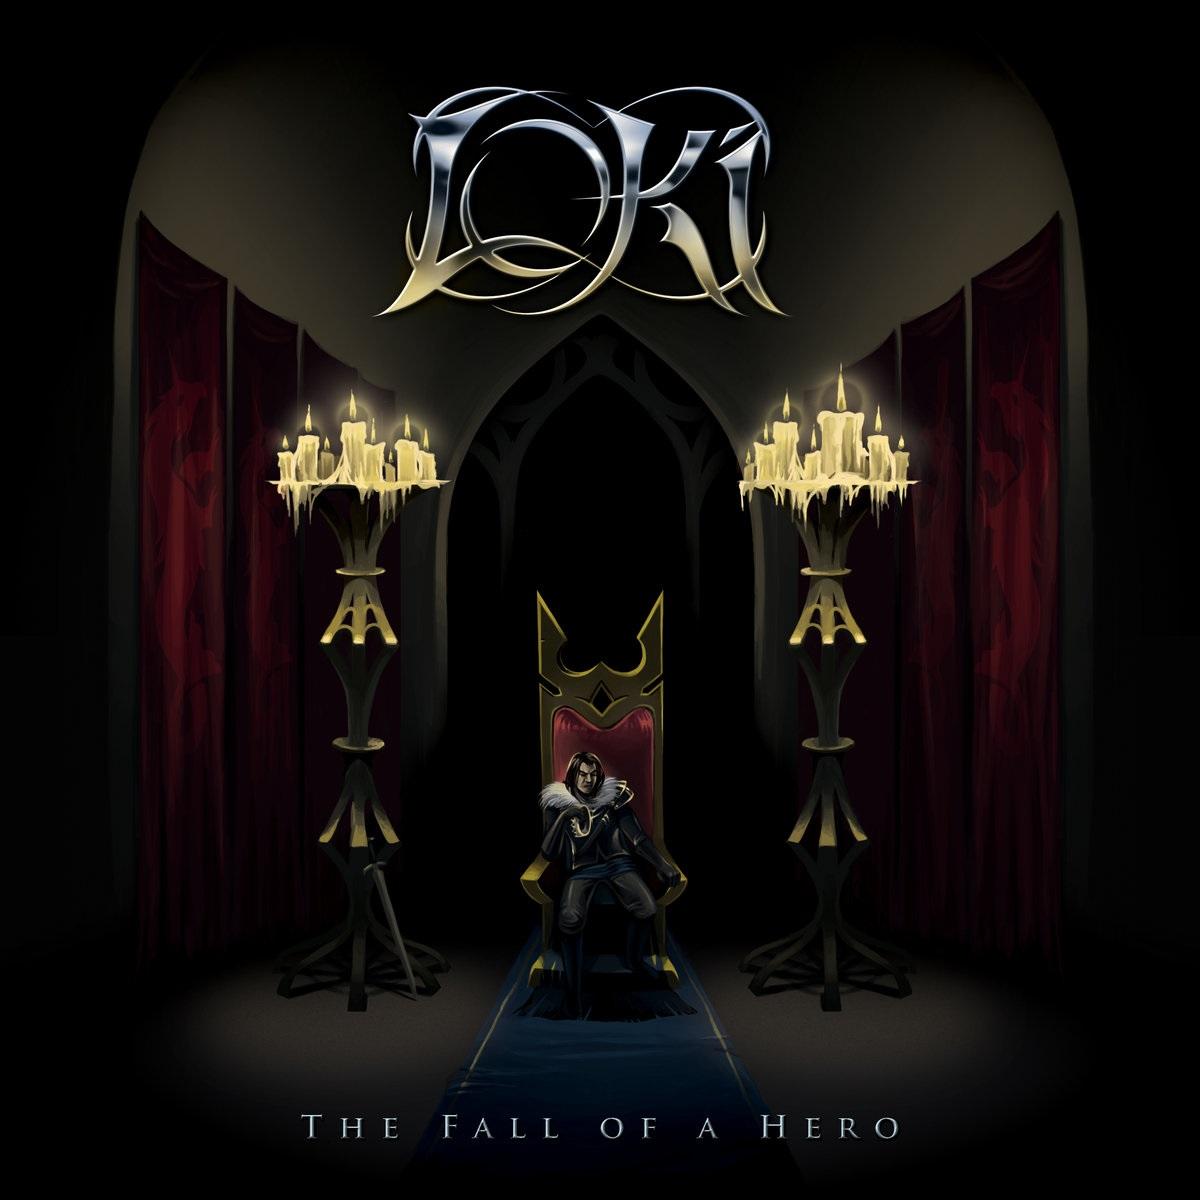 Loki - The Fall of a Hero